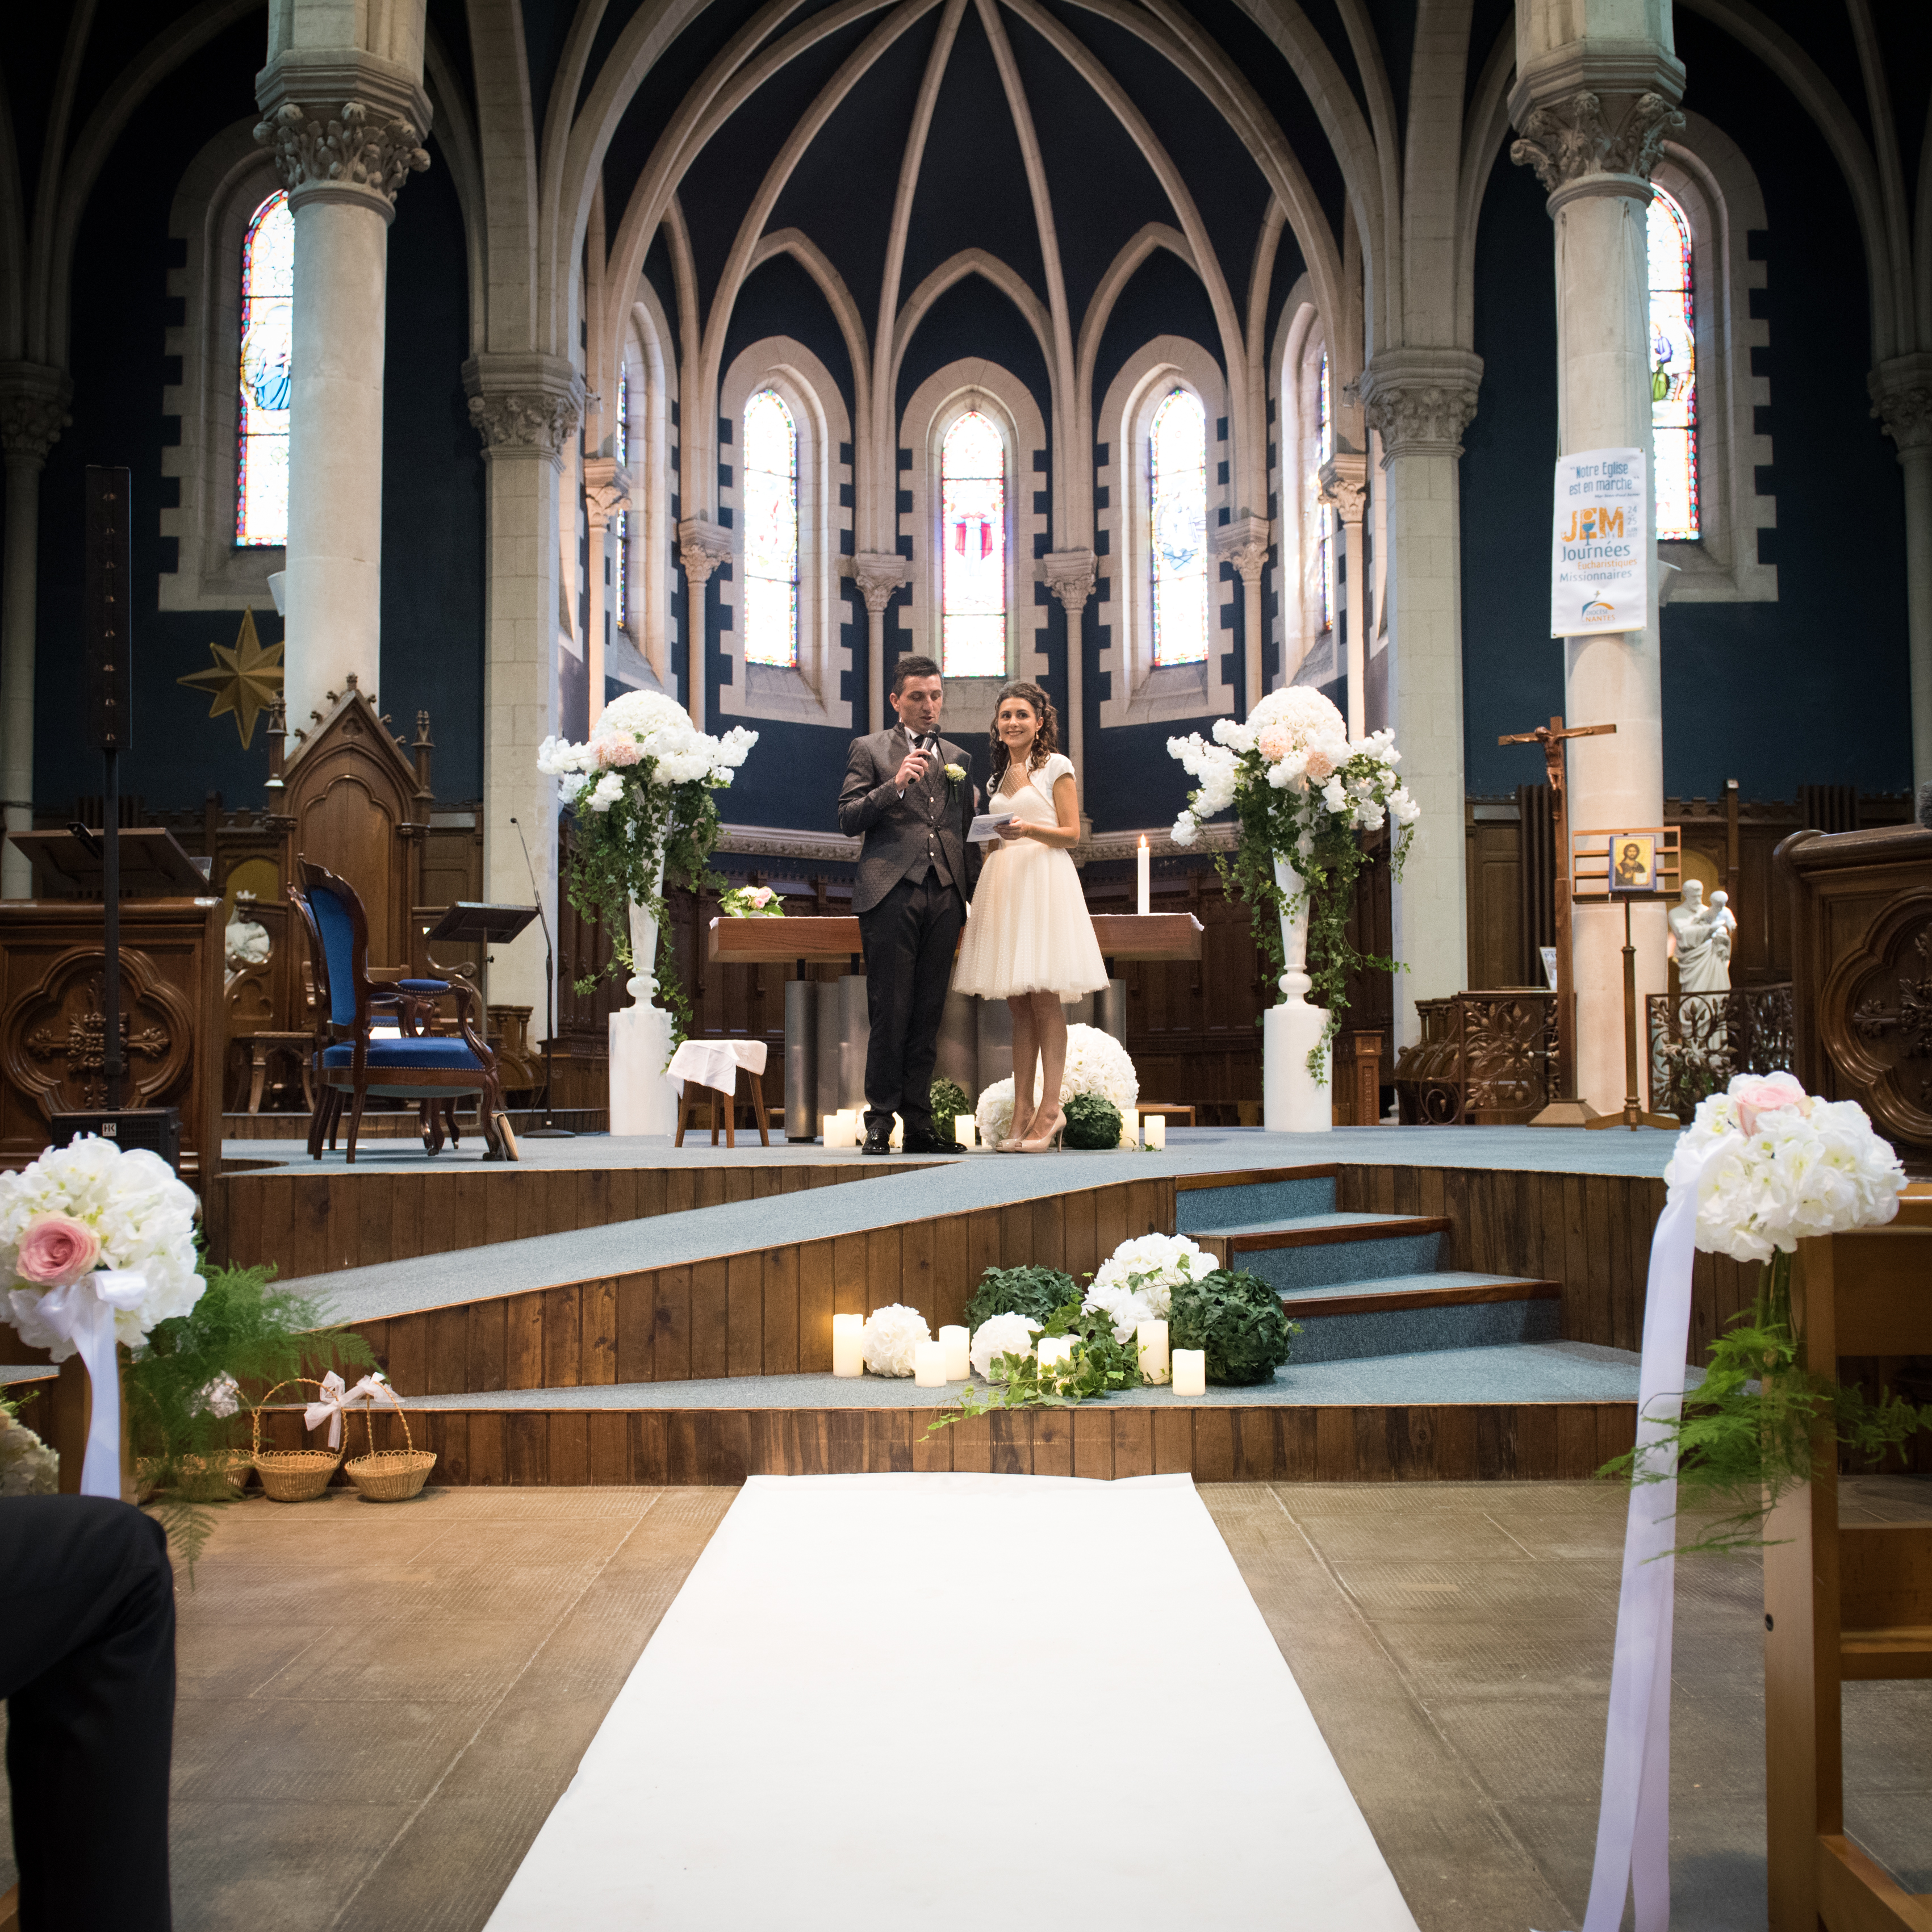 photographe mariage montaigu